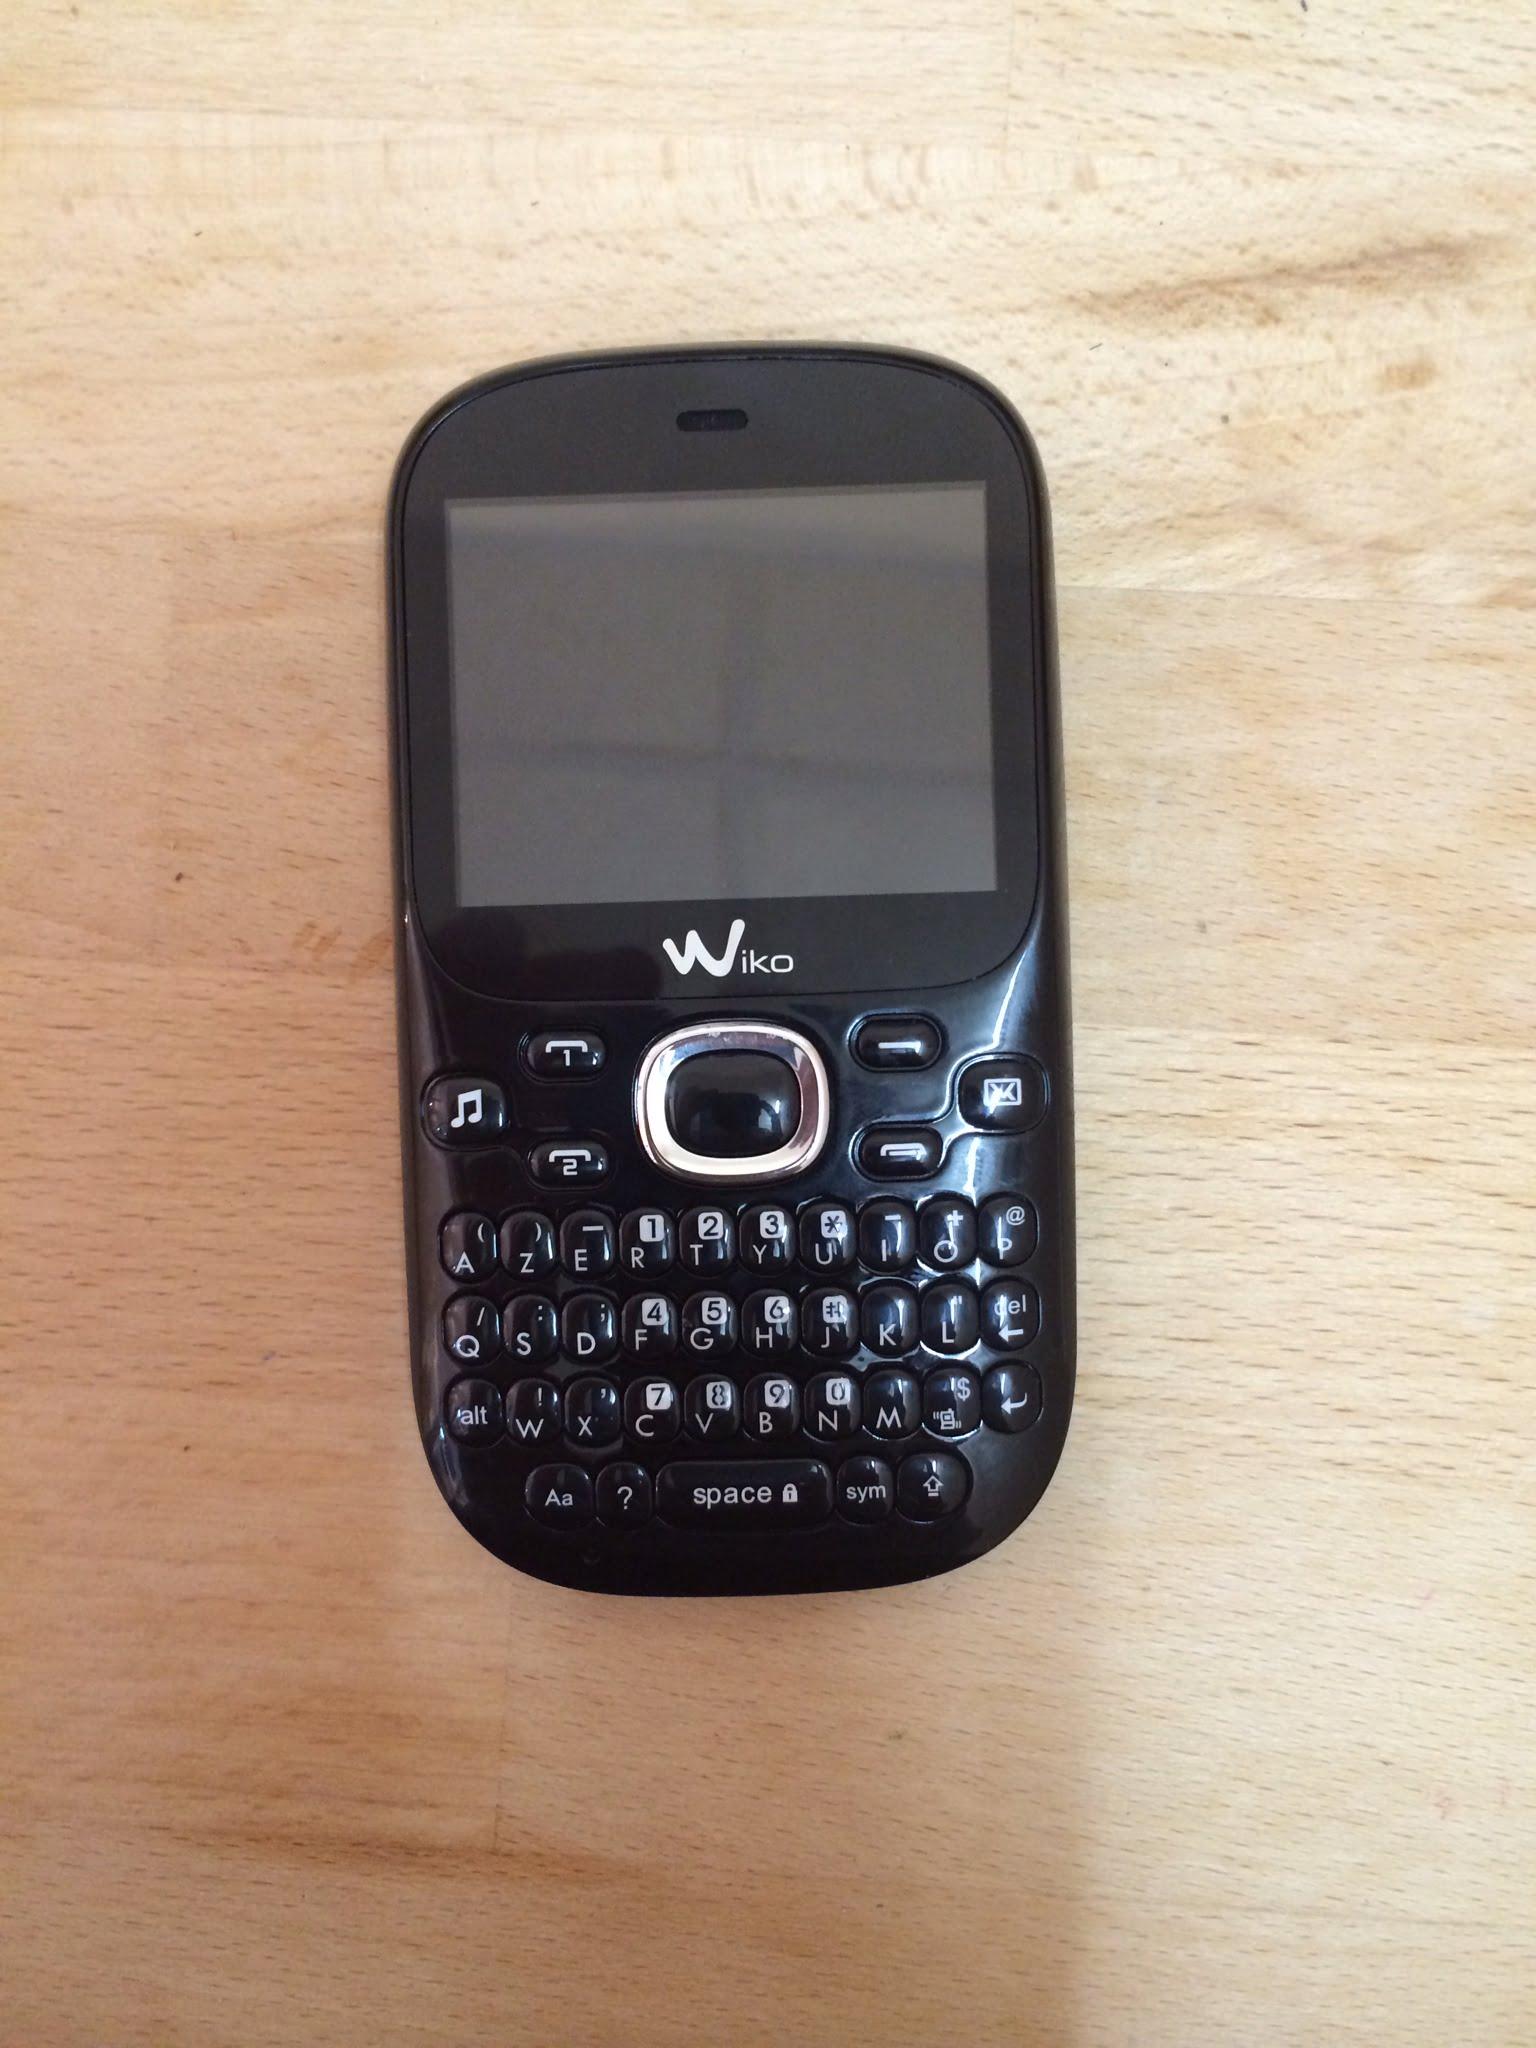 015c3b50a88d6246d503fba0a7d9ff671d0372339c Test du Wiko Minz+, un BlackBerry-like vraiment pas cher